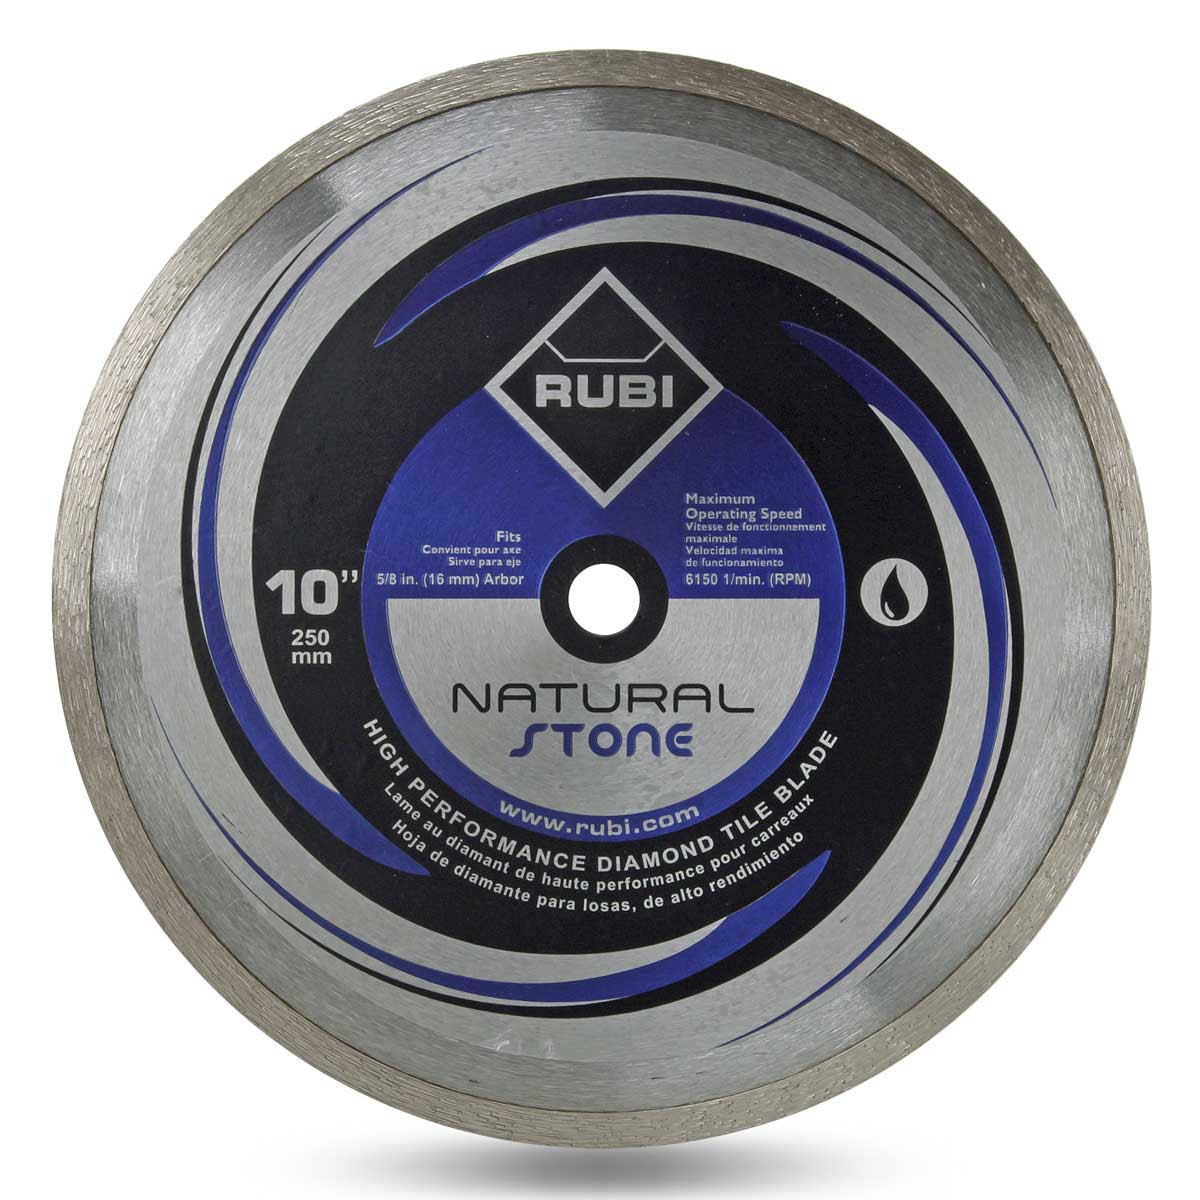 rubi 10in natural stone diamond blade